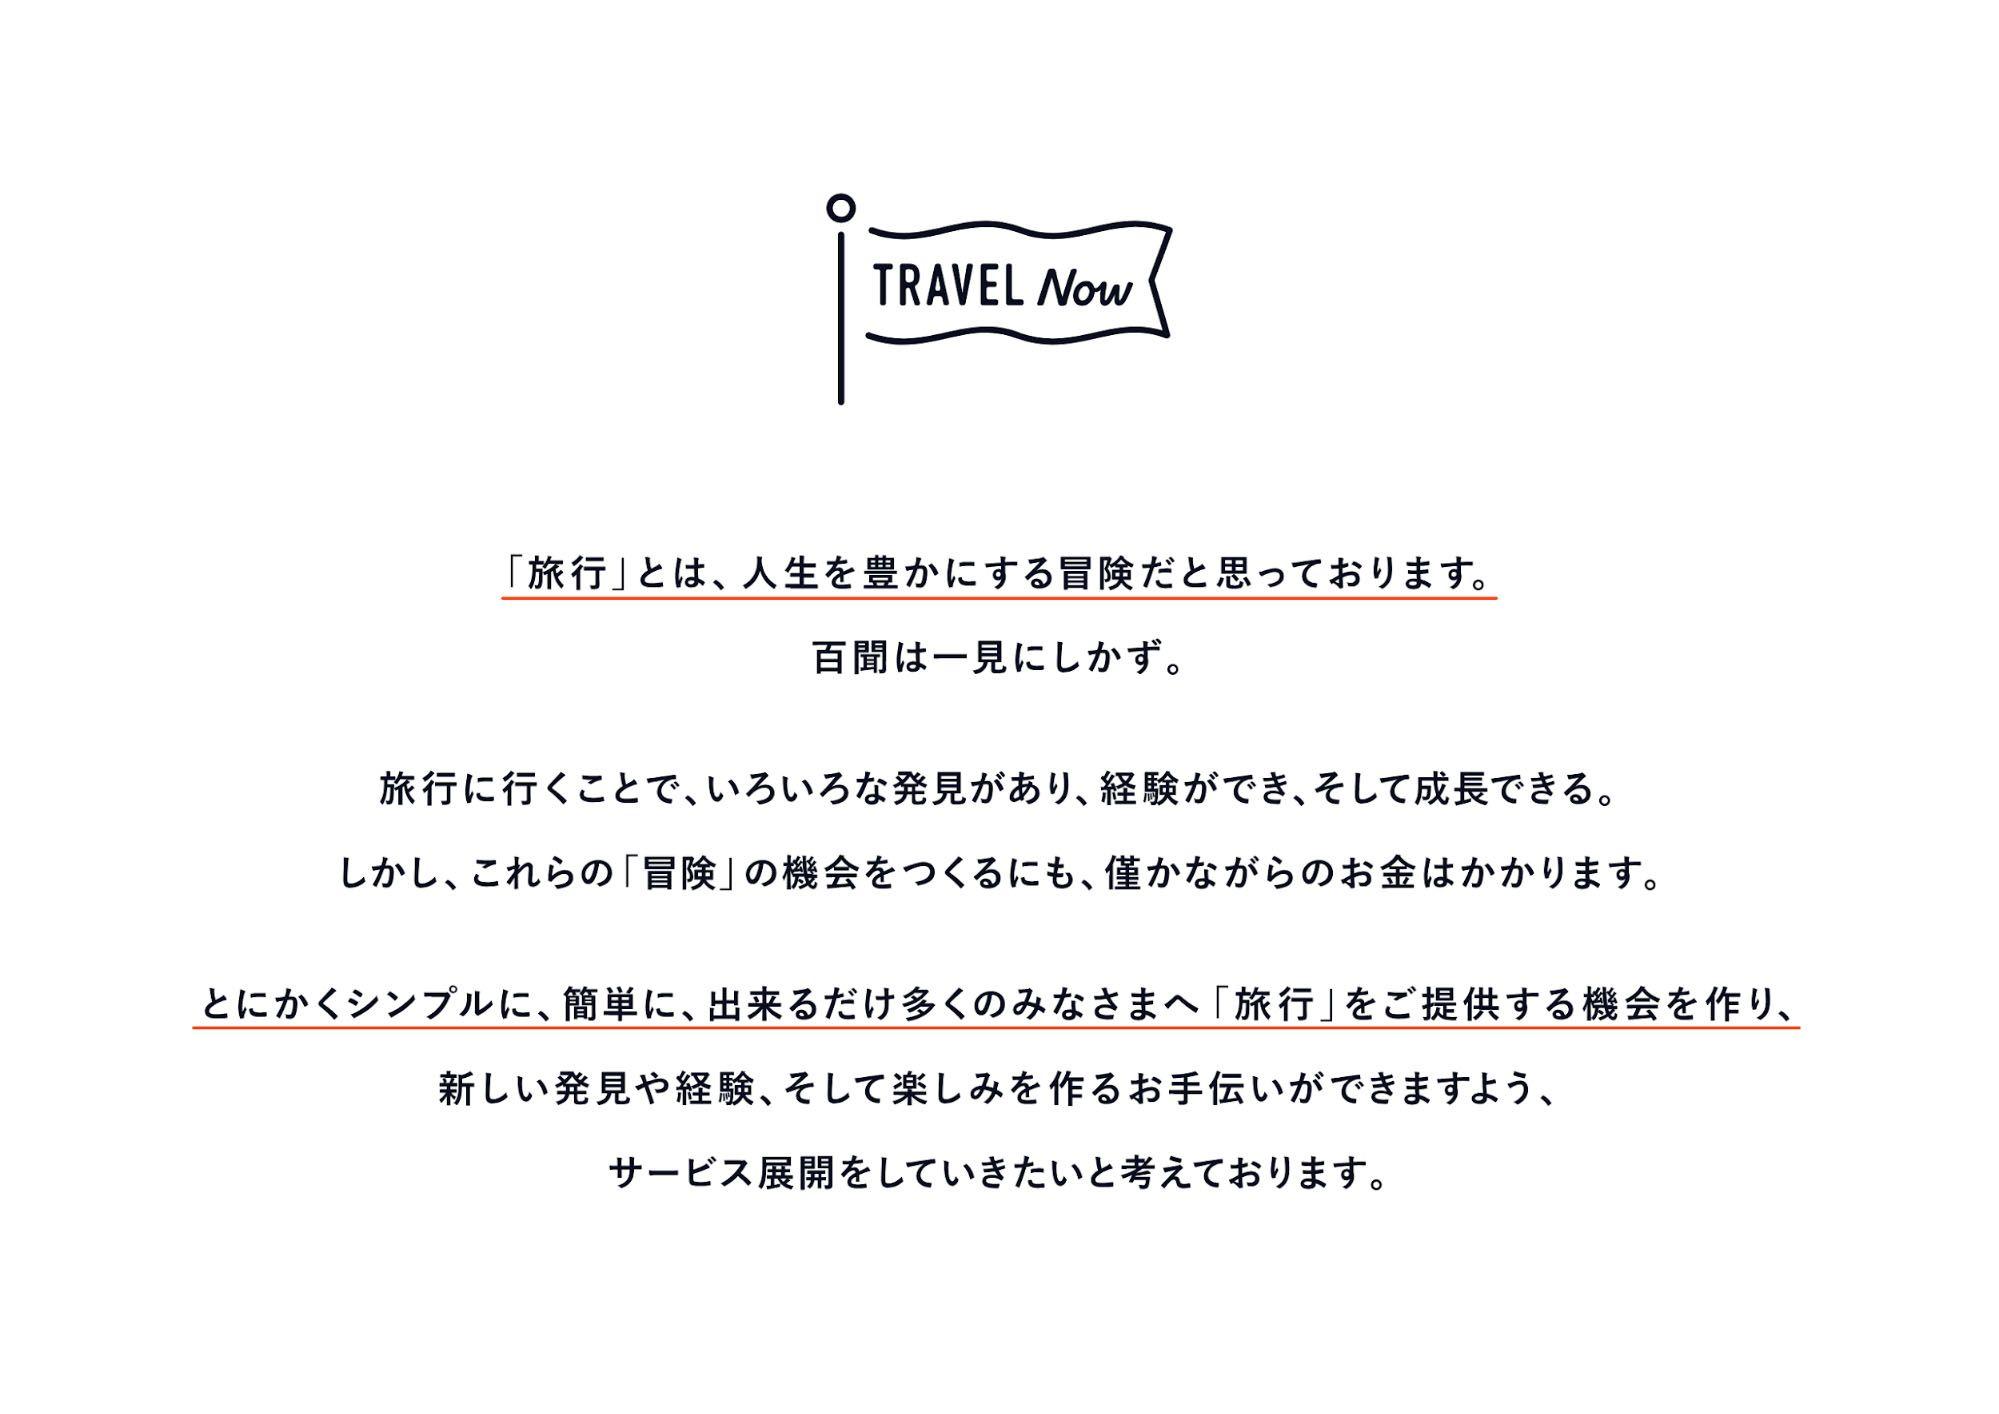 TRAVEL Nowのステートメント